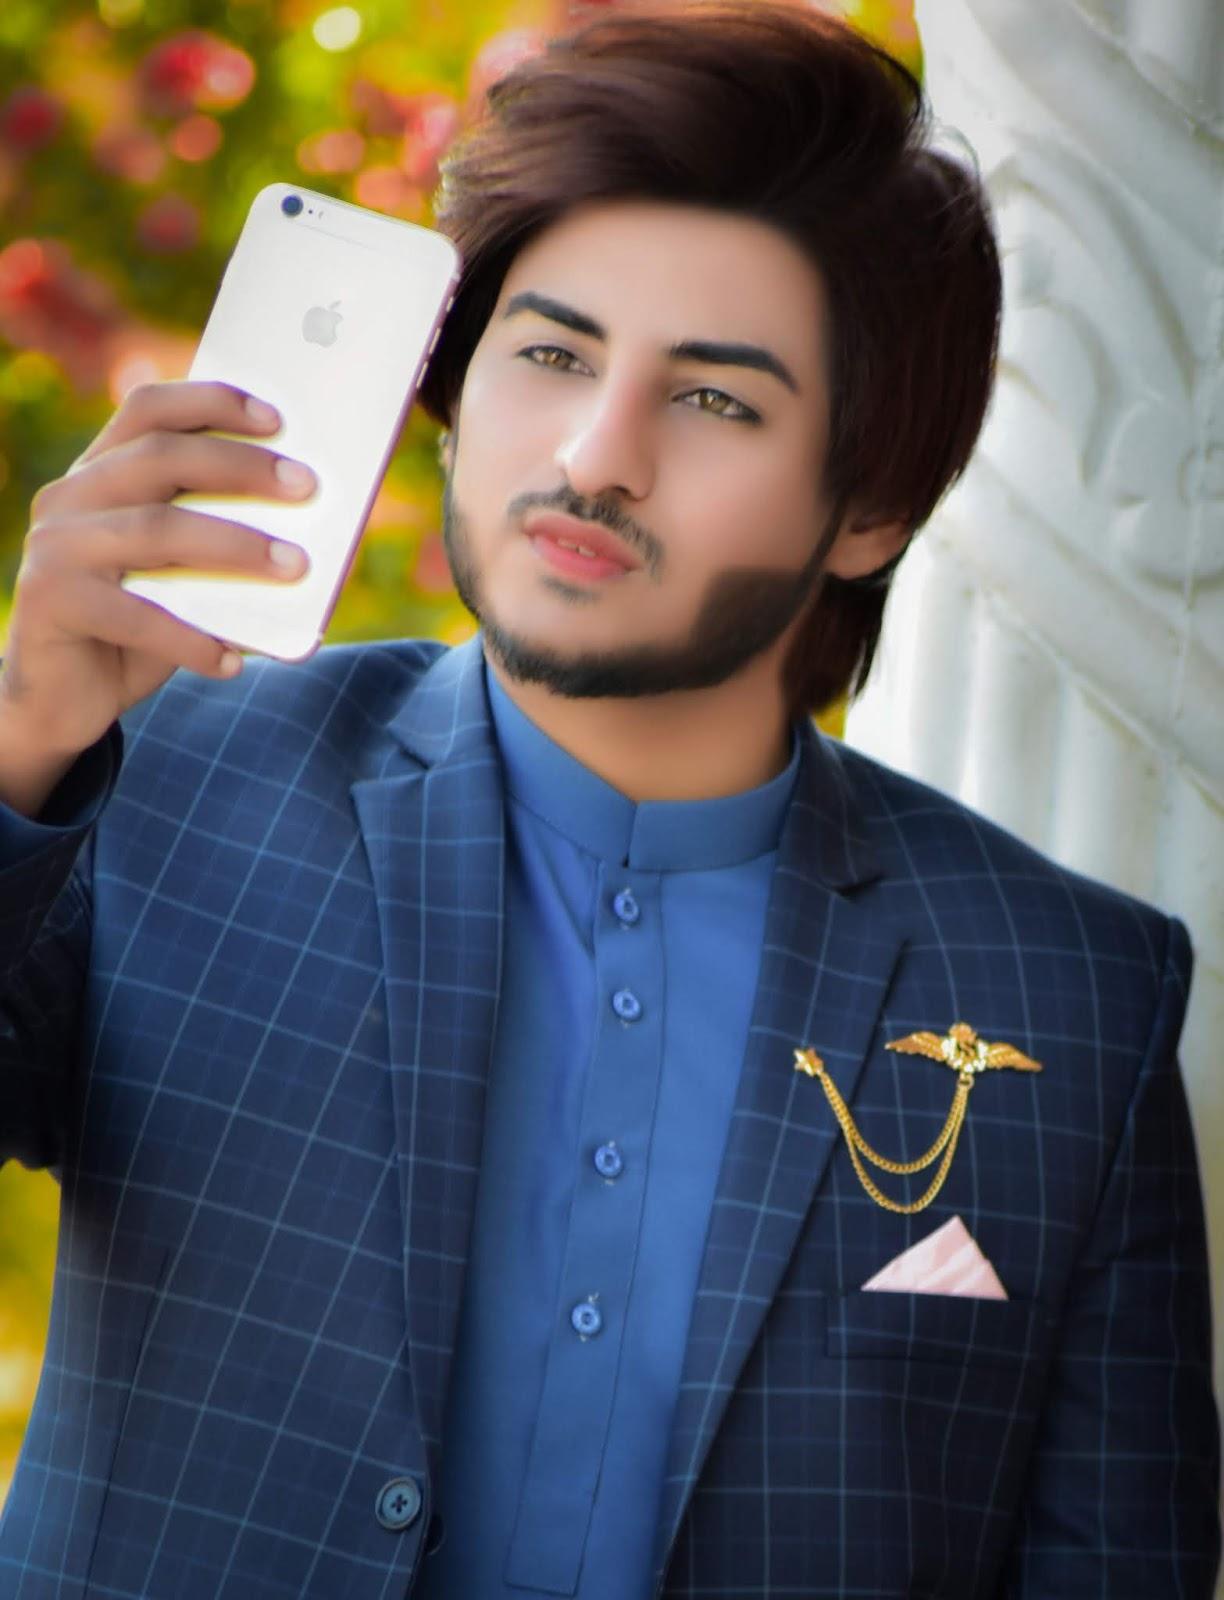 New Trendy Hair Style In Pakistan In 2019 2020 For Man Women